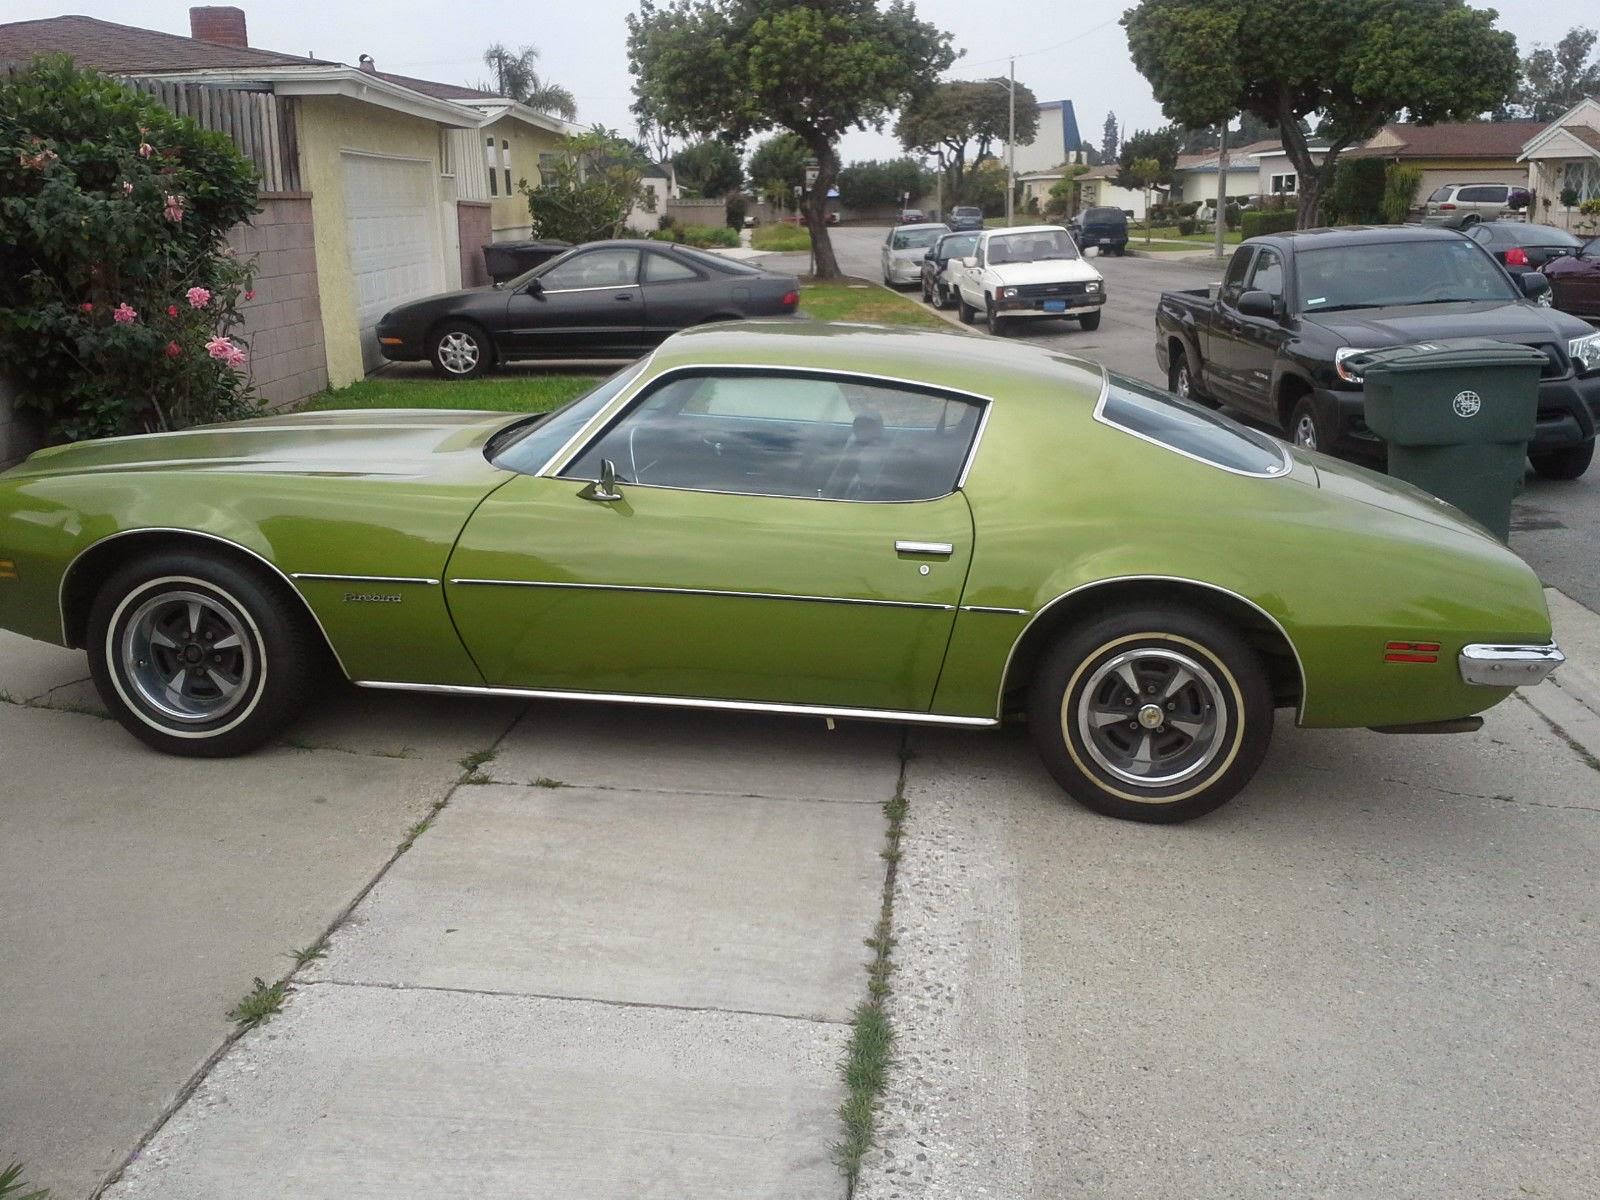 1971 Ford Ltd 2 Door Convertible further Brake Light Wiring3 further 381504135246 together with 350366045982146196 further Hog4vu. on pontiac firebird 5 0 formula